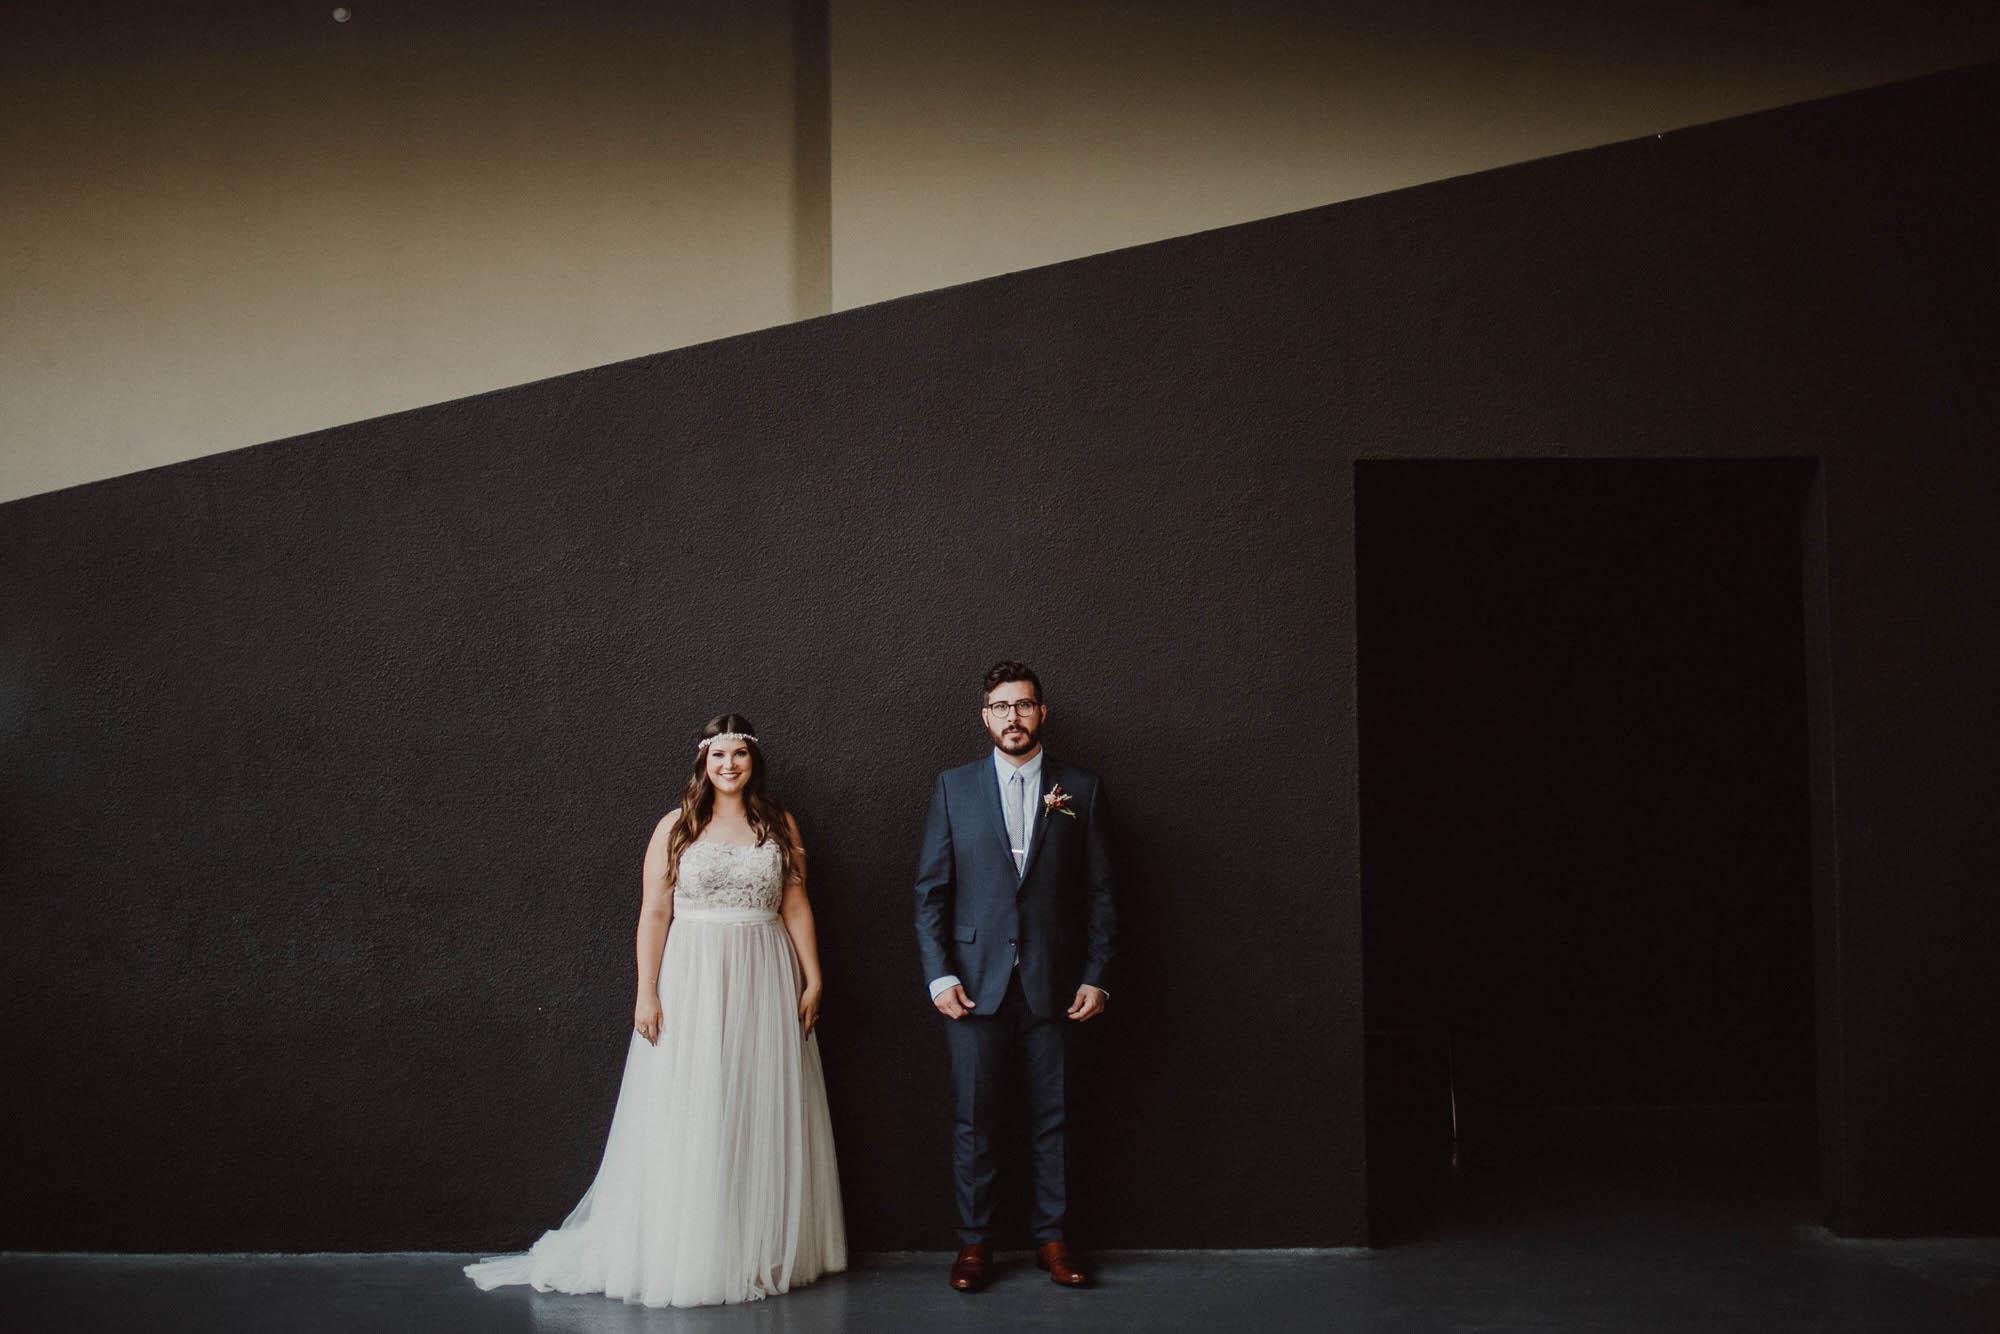 los-angeles-wedding-photographer-kristen-dylan-40.jpg